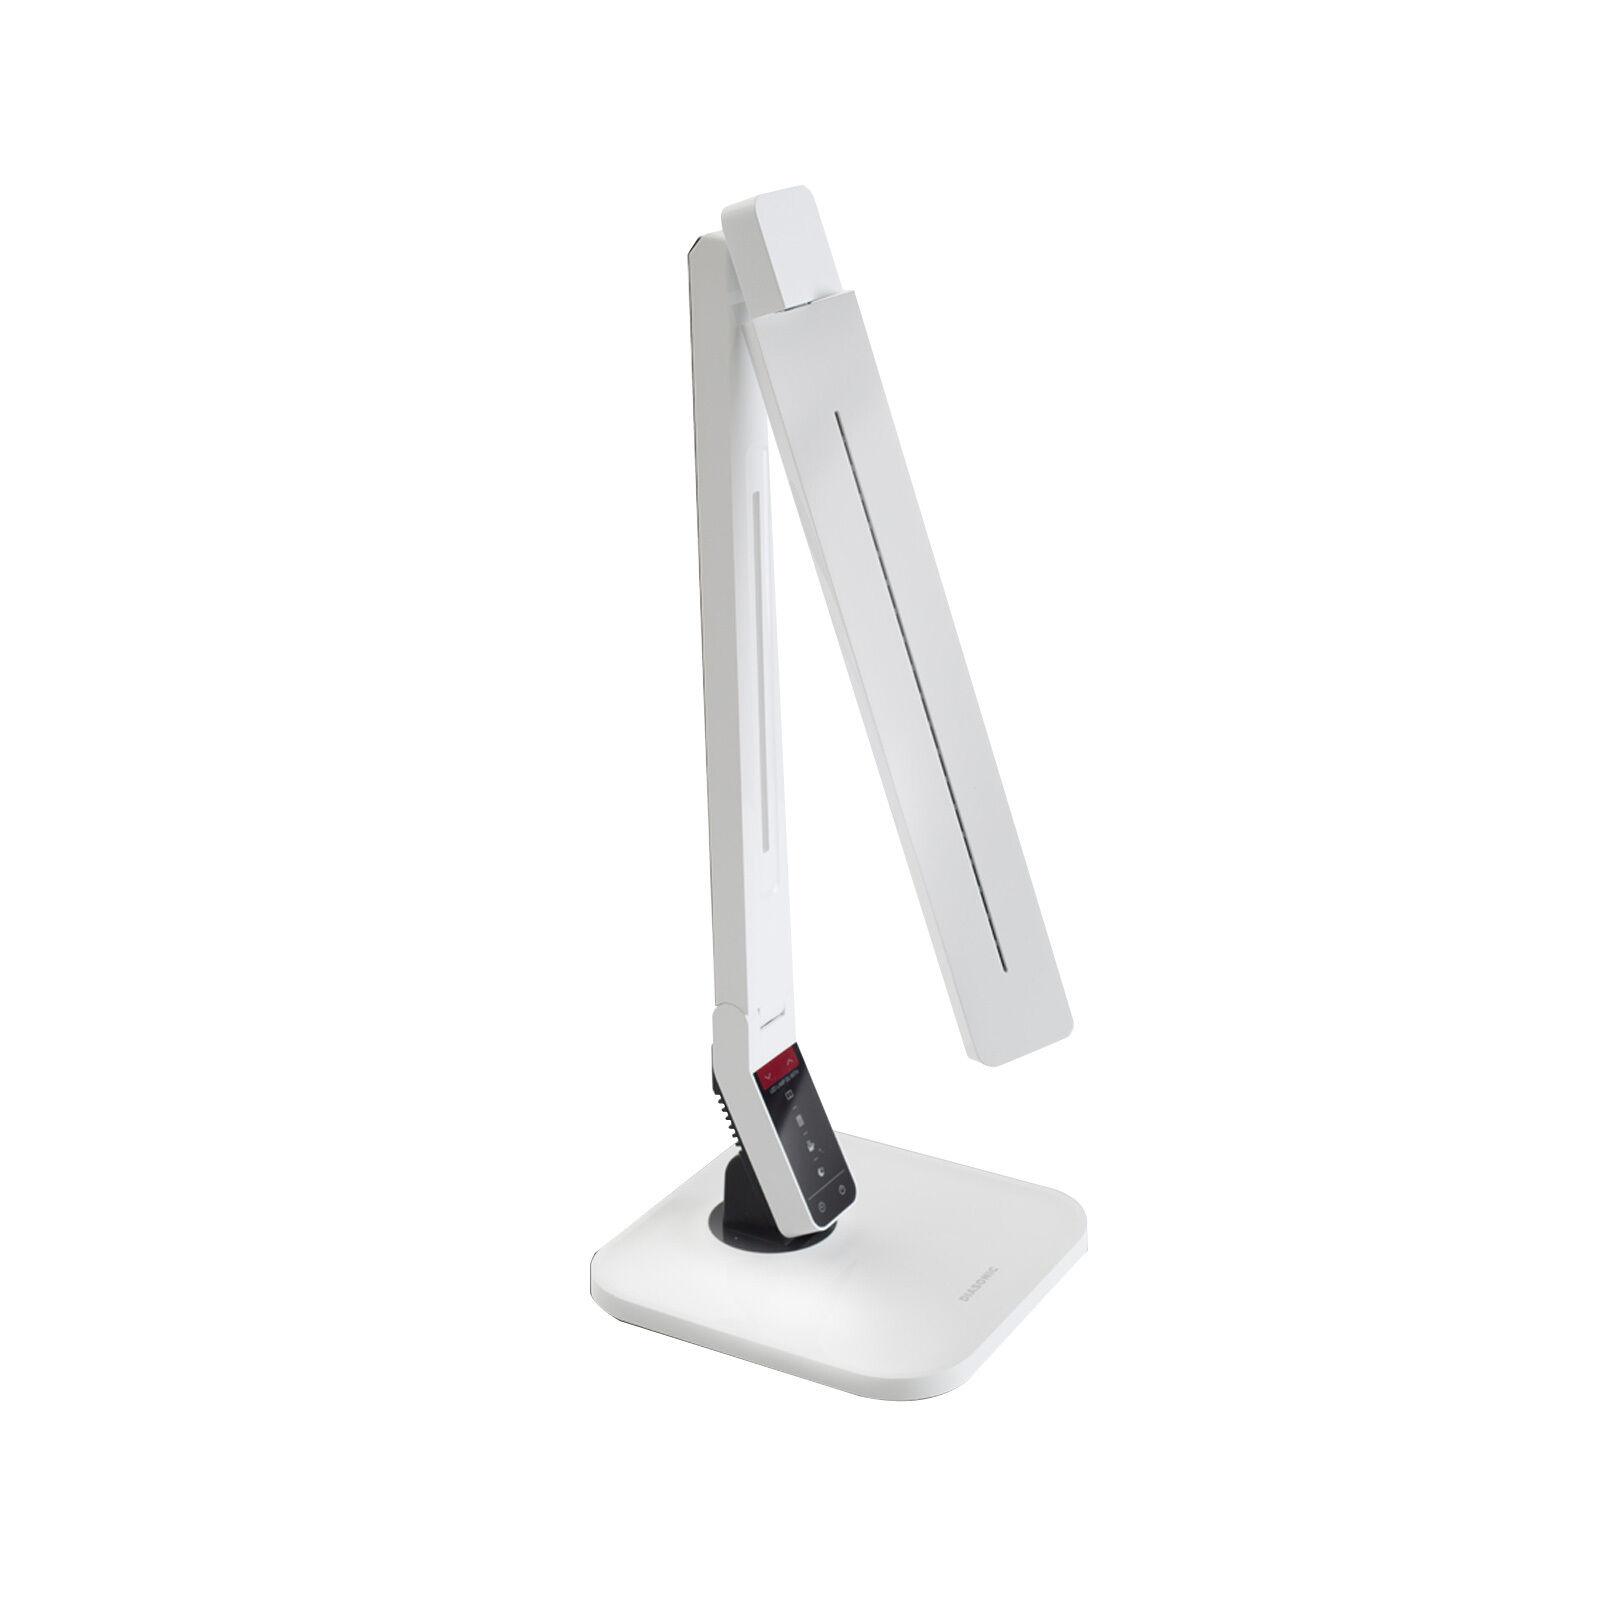 DIASONIC DL-95TH LED Desk Lamp Stand Timer USB Port For Home Office -blanco